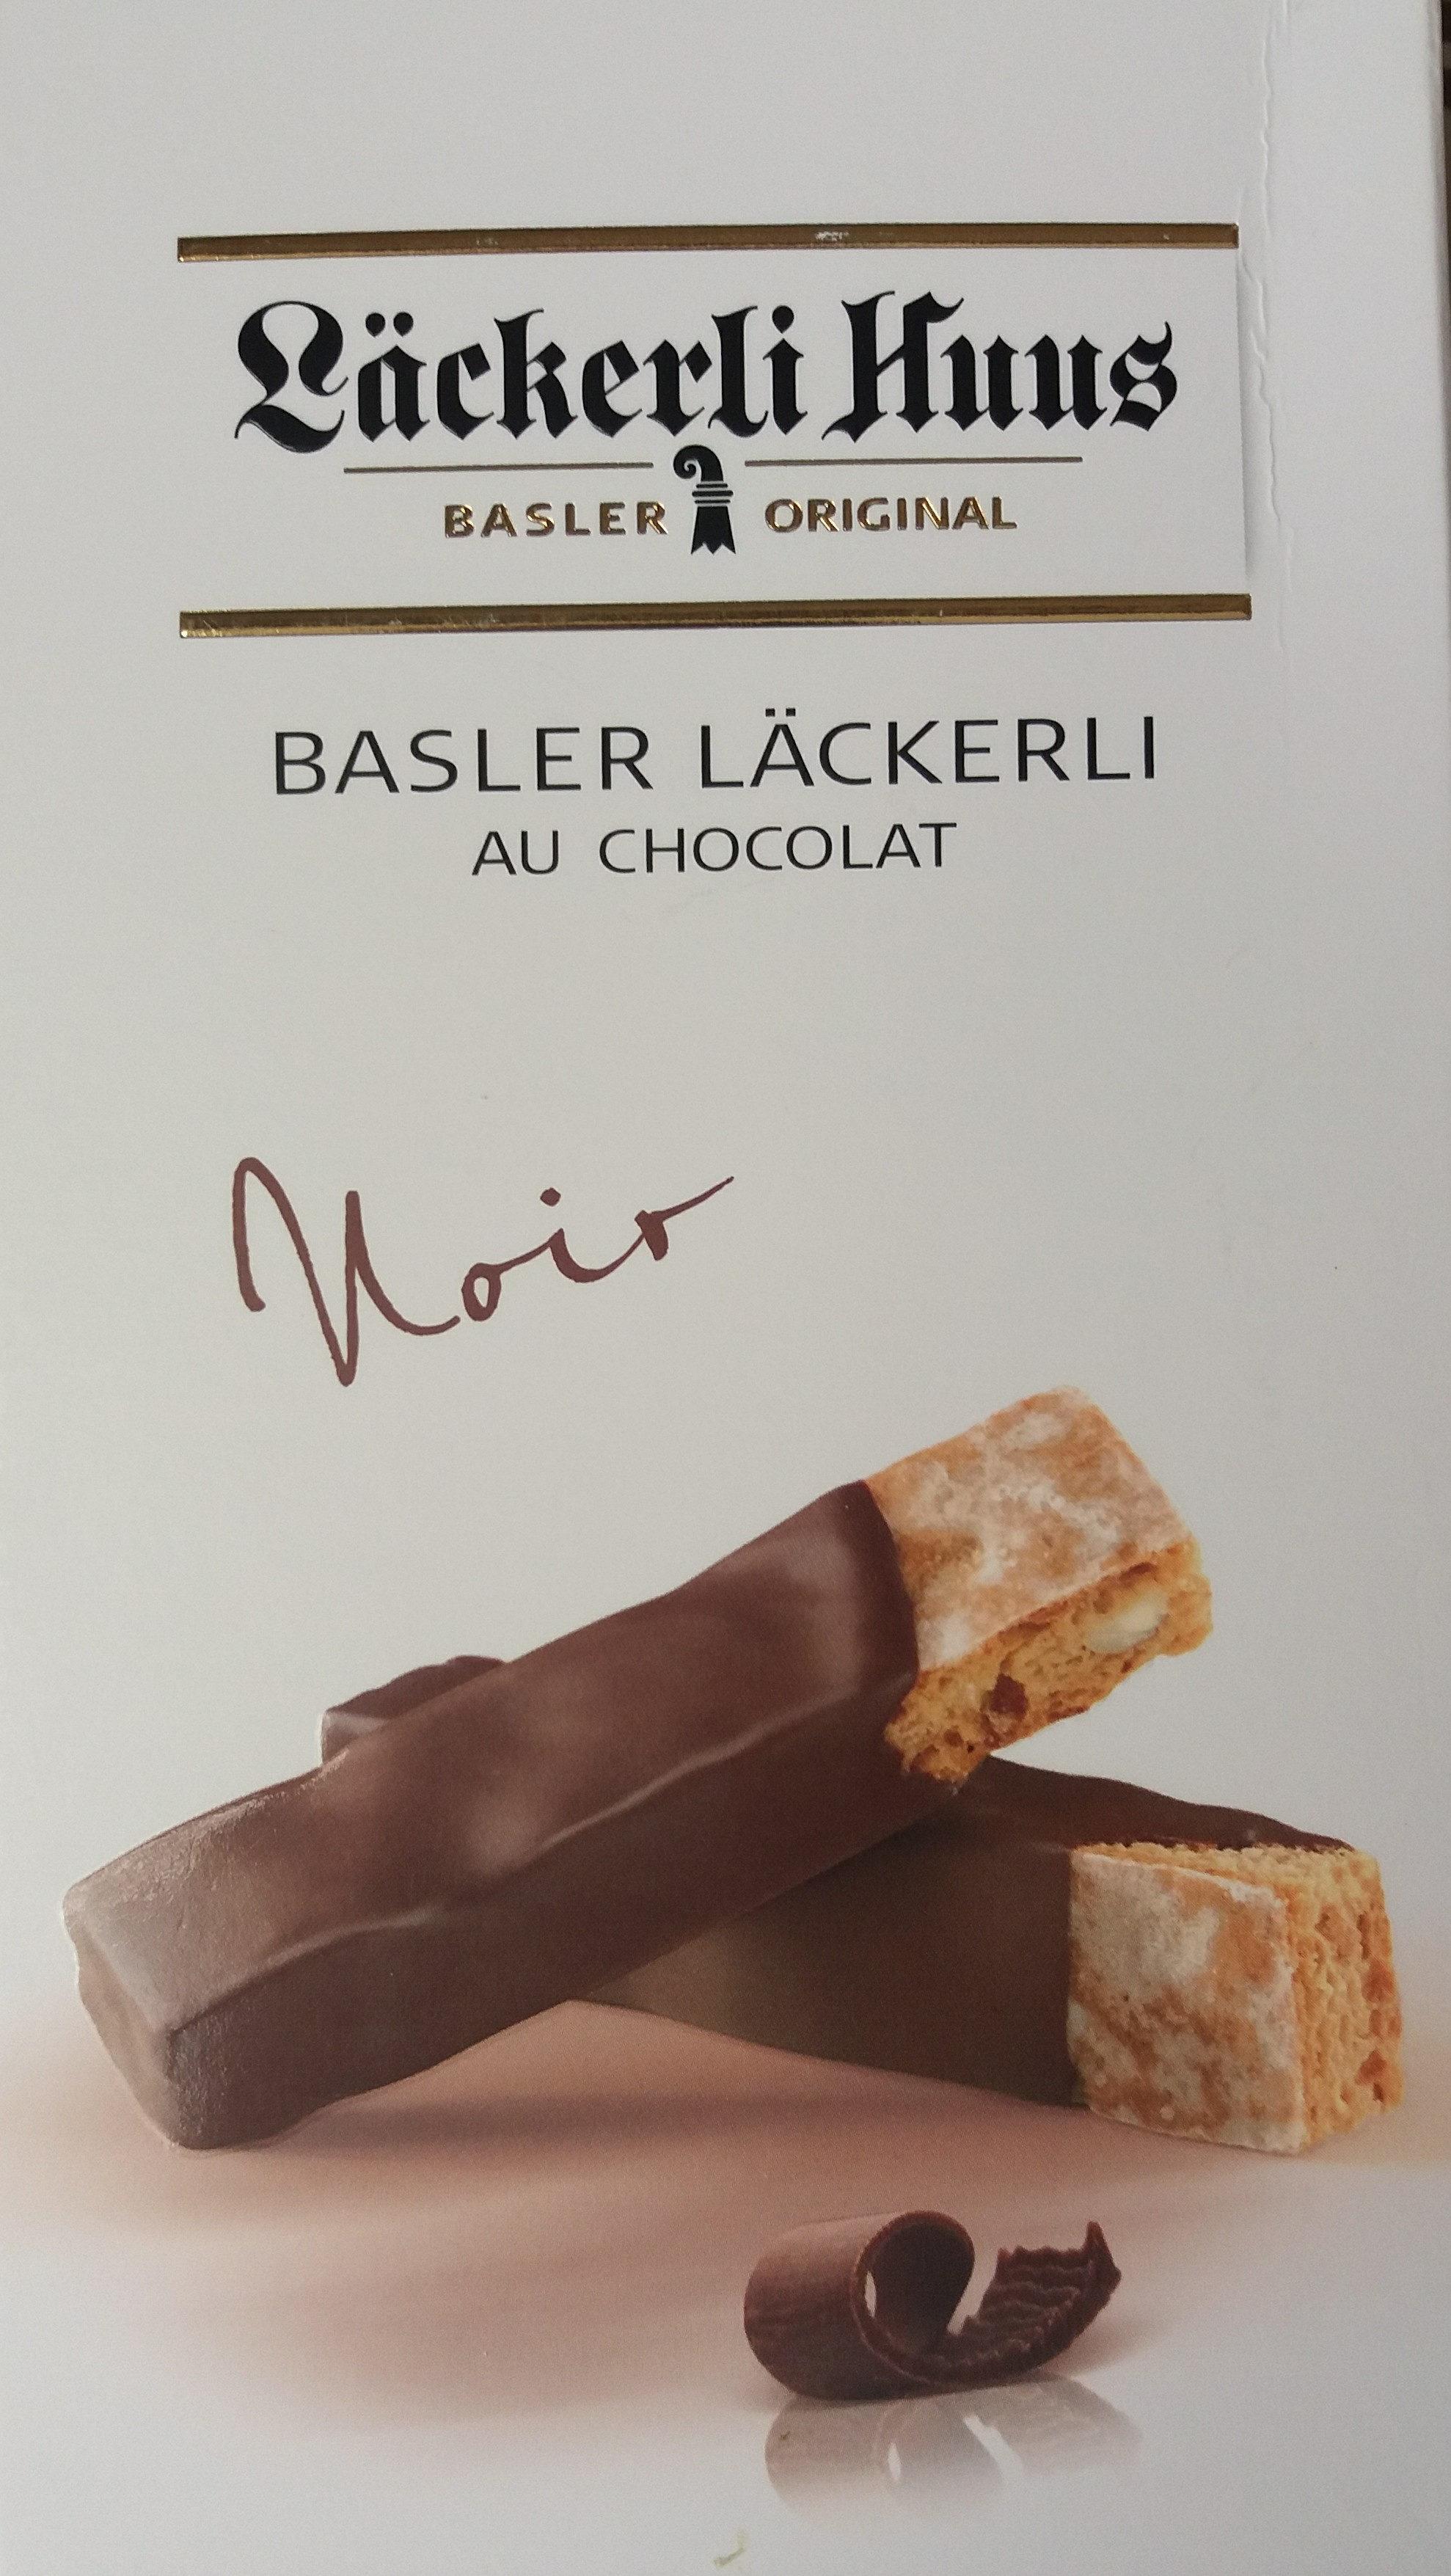 Läckerli Huus au chocolat - Product - fr